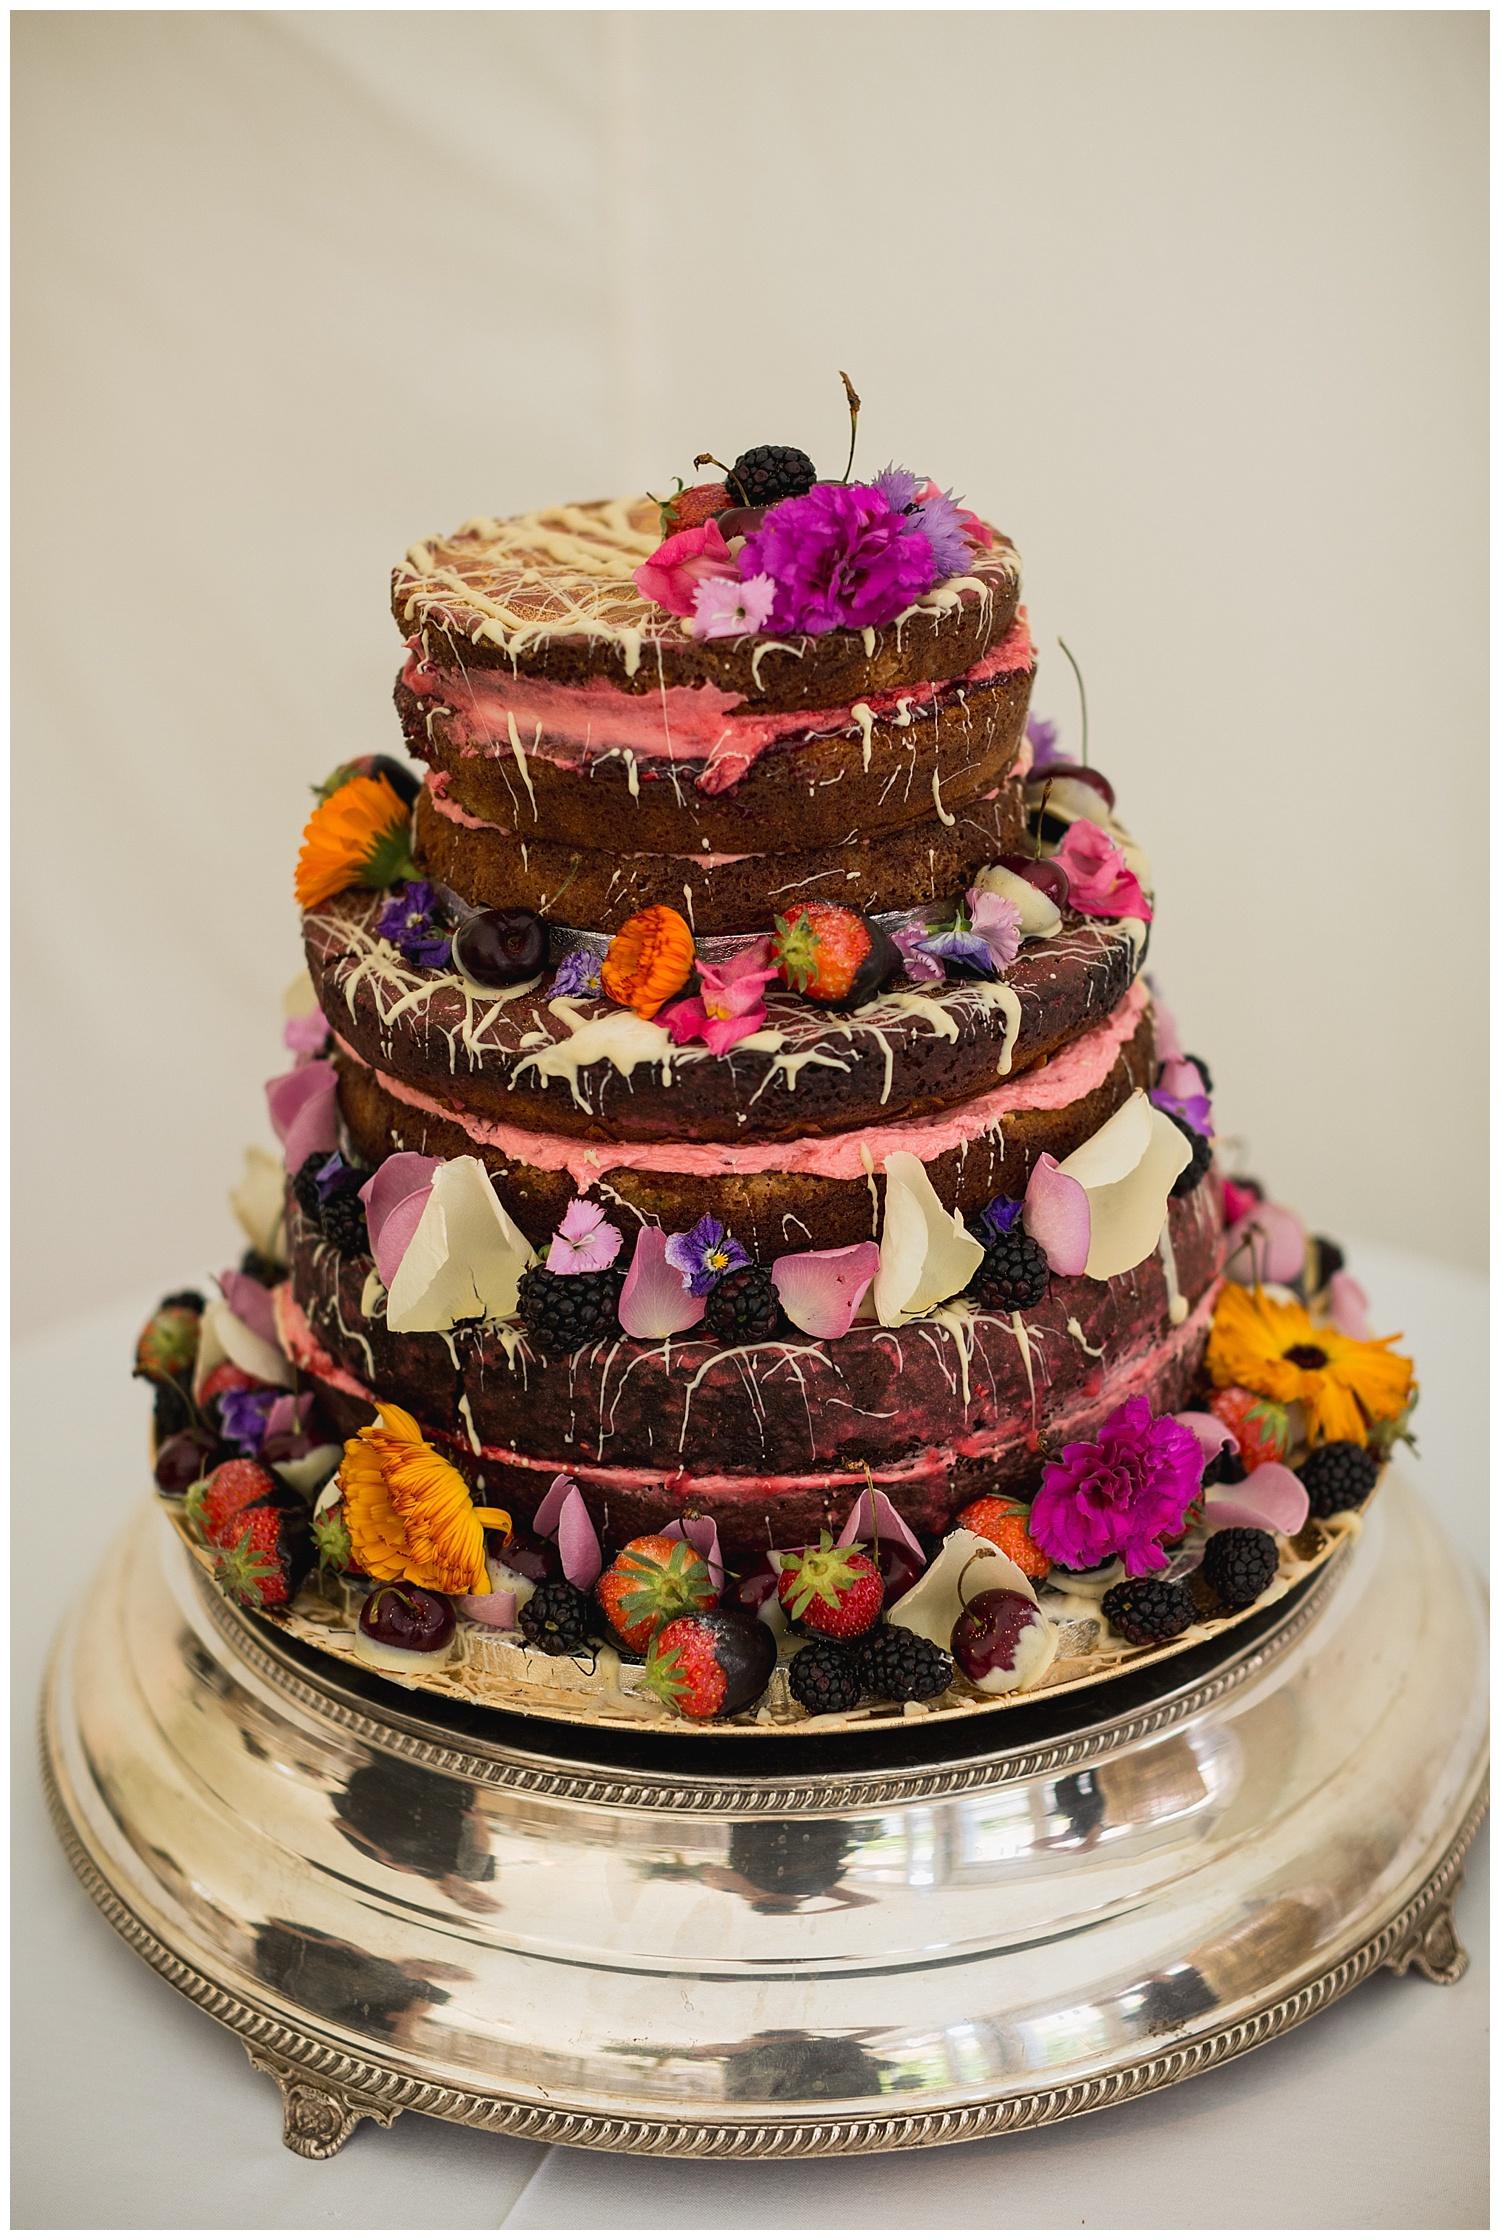 homemade-wedding-cake.jpg